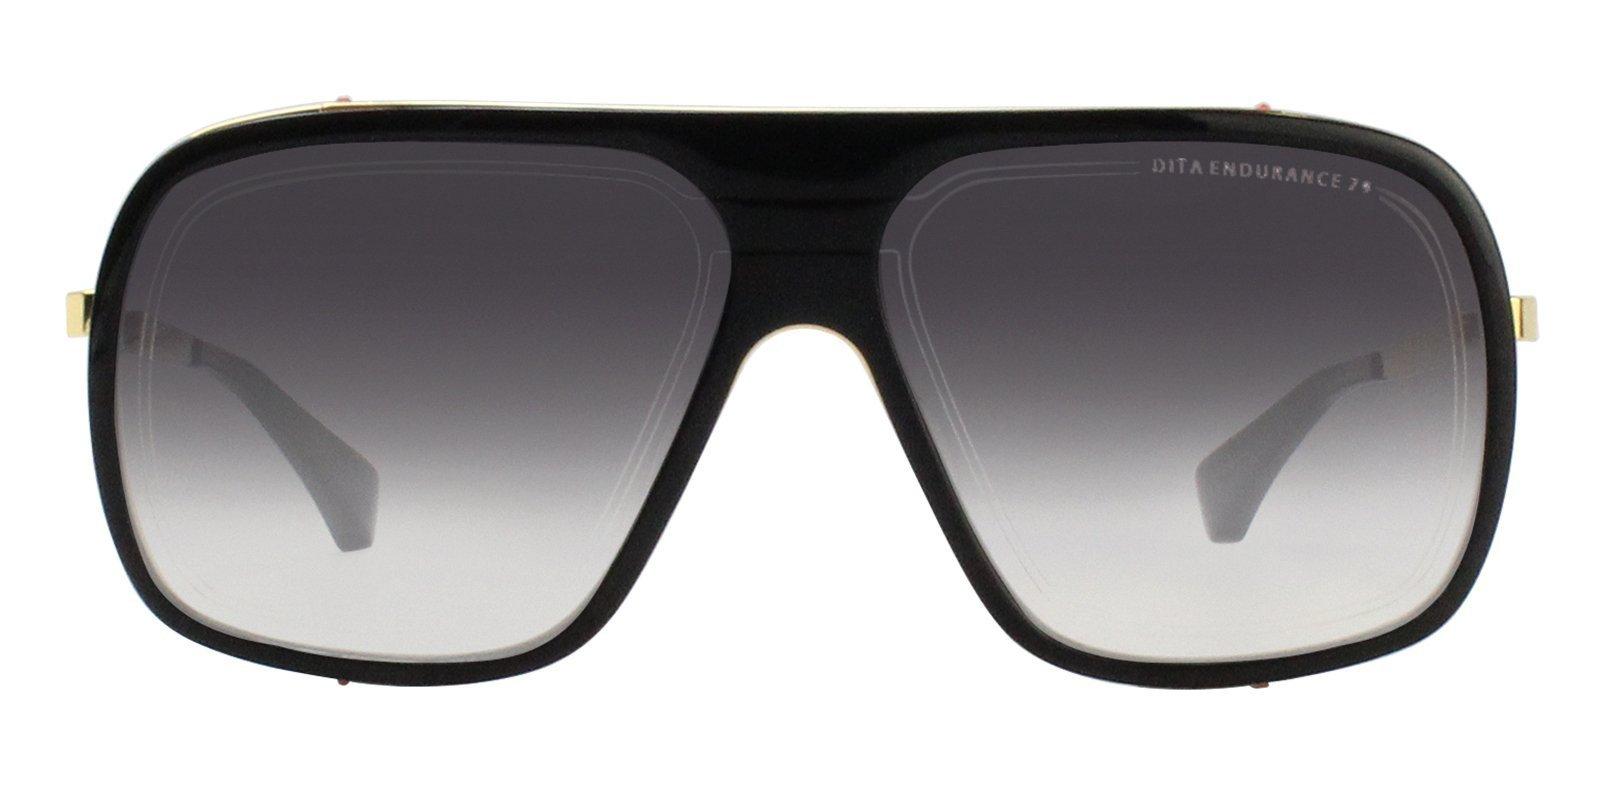 c7e09b0d65e dita-sunglasses-dita-endurance -79-black-gold-dark-grey-to-clear-designer-eyes-814981025675